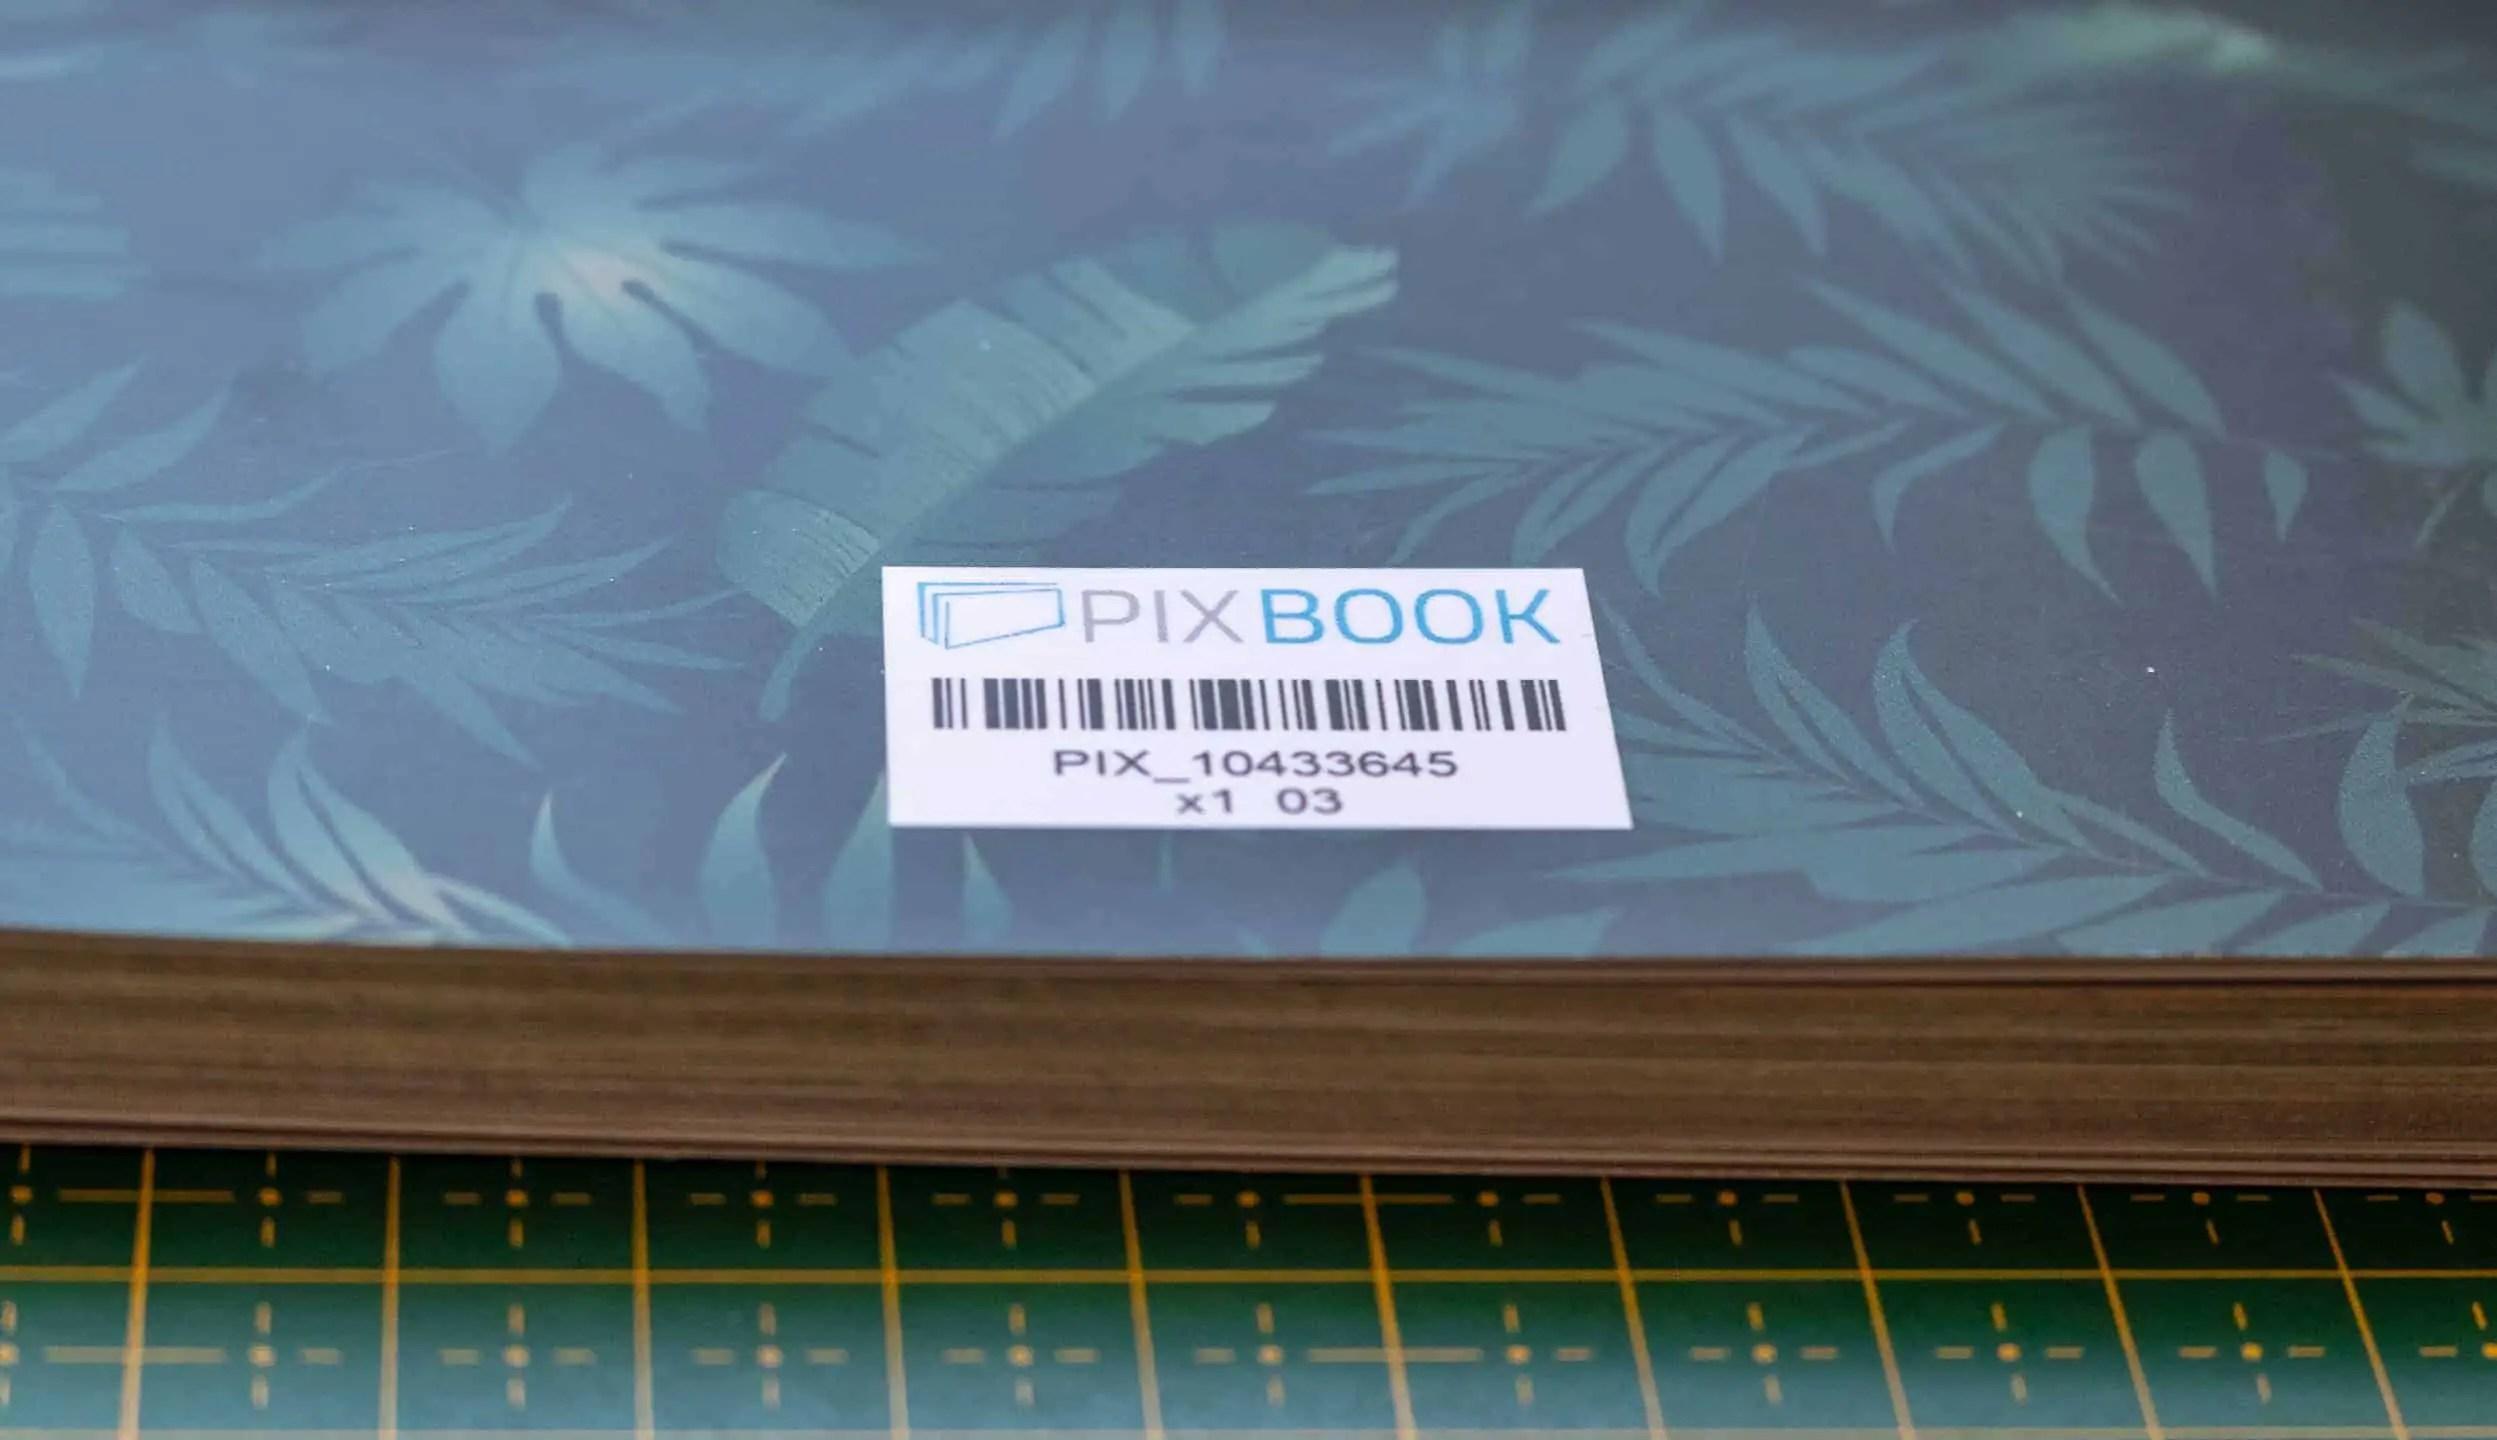 Mini ksiażka fotograficzna Pixbook 7 - Mini książka fotograficzna  Pixbook. Czy warto ?